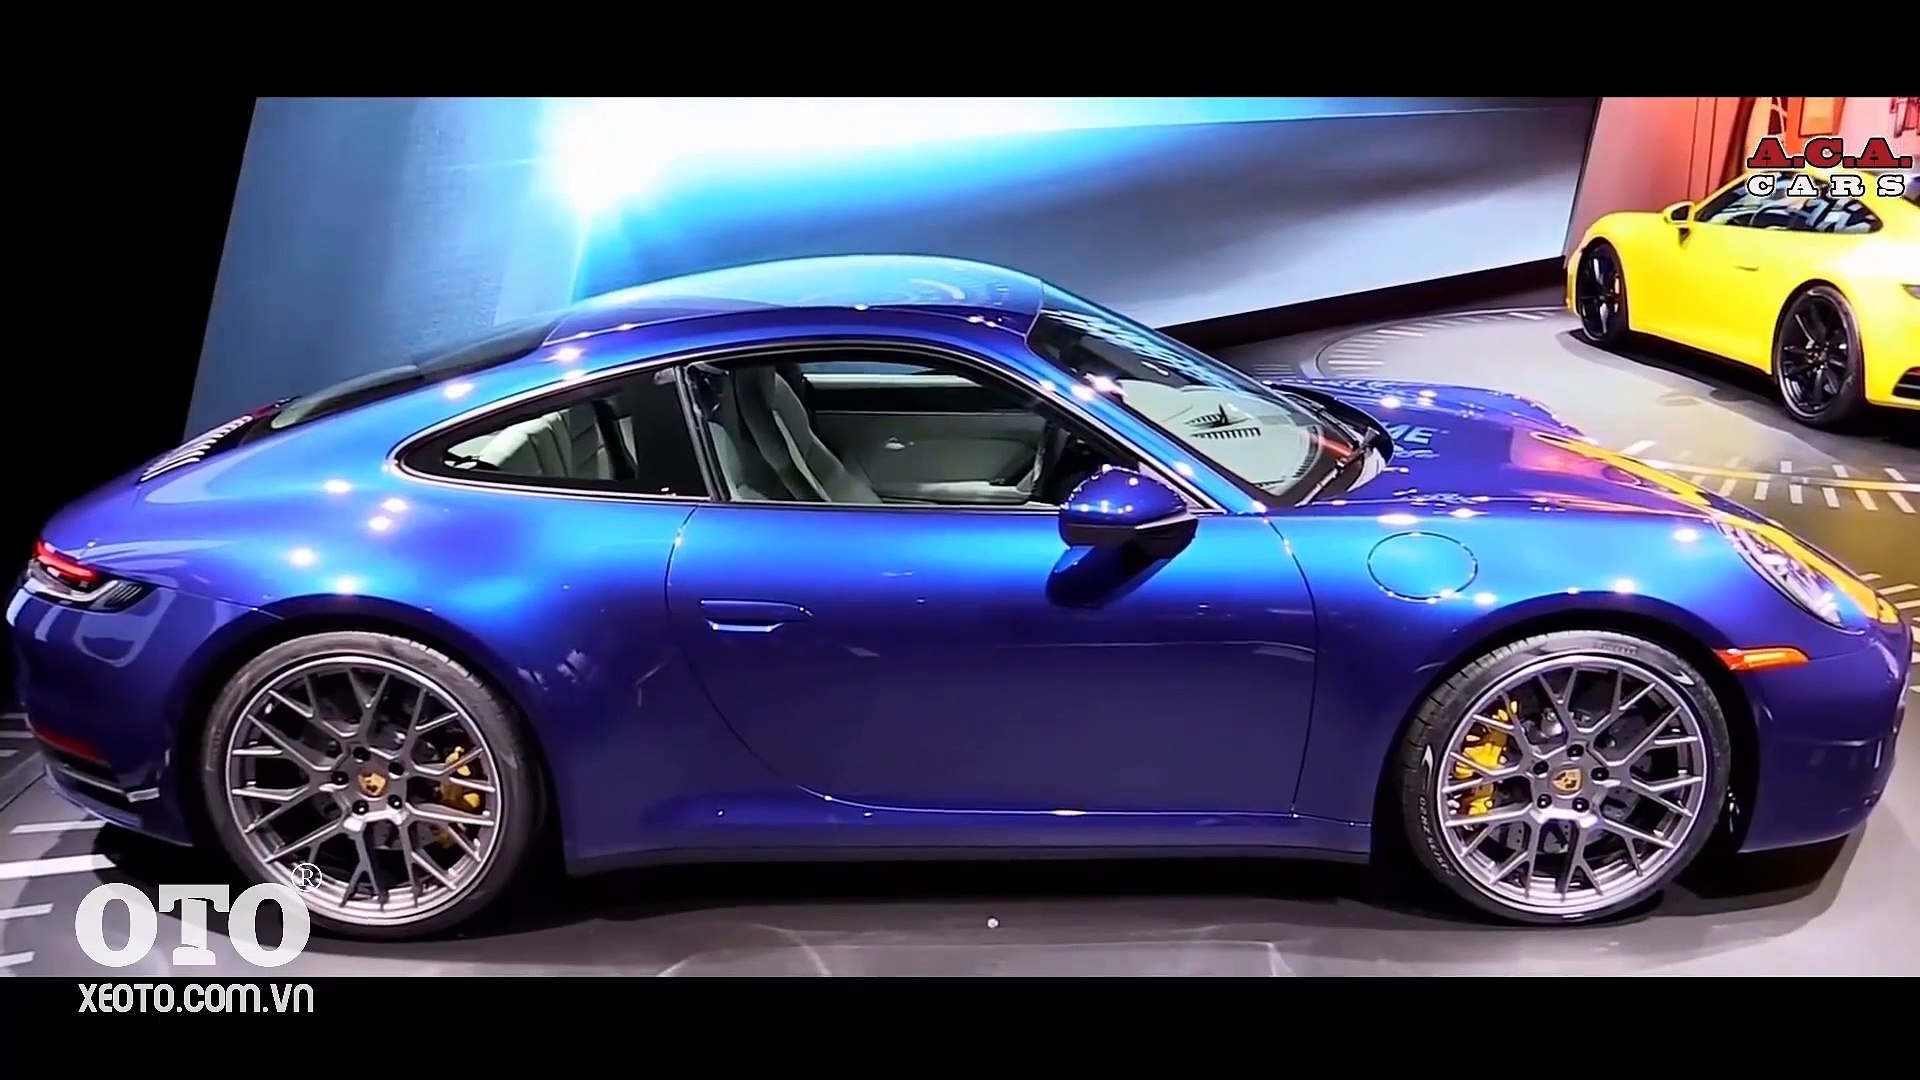 PORSCHE 911 CARRERA 4S 2020 SUPER SPORT: HÌNH ẢNH NỘI NGOẠI THẤT XE